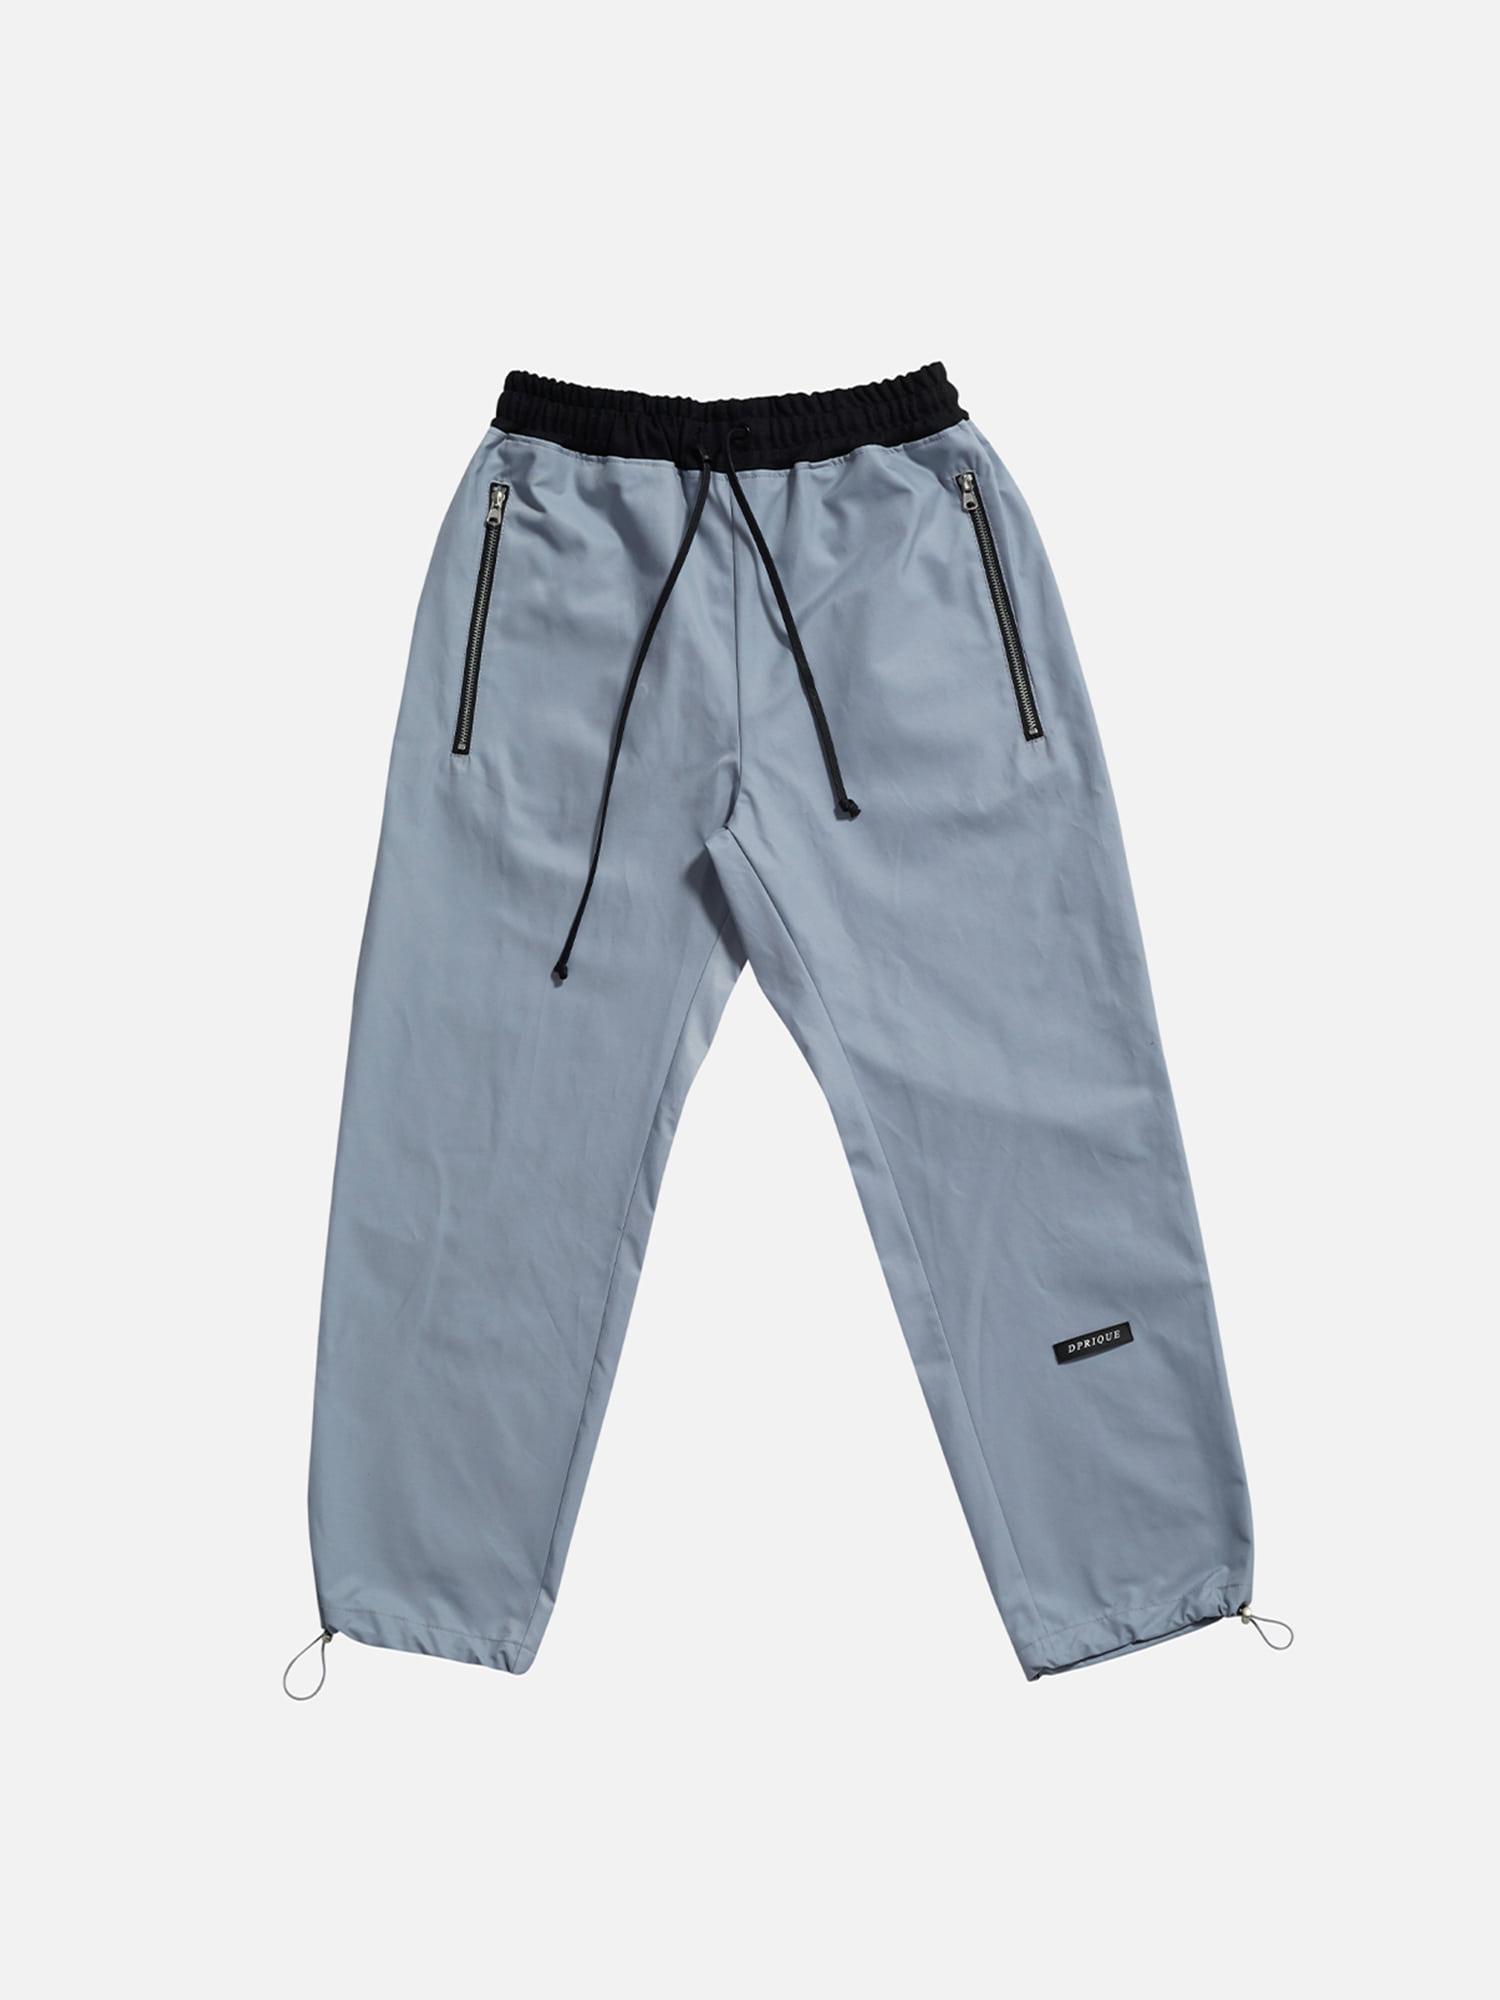 07 String Jogger Pants - Blue